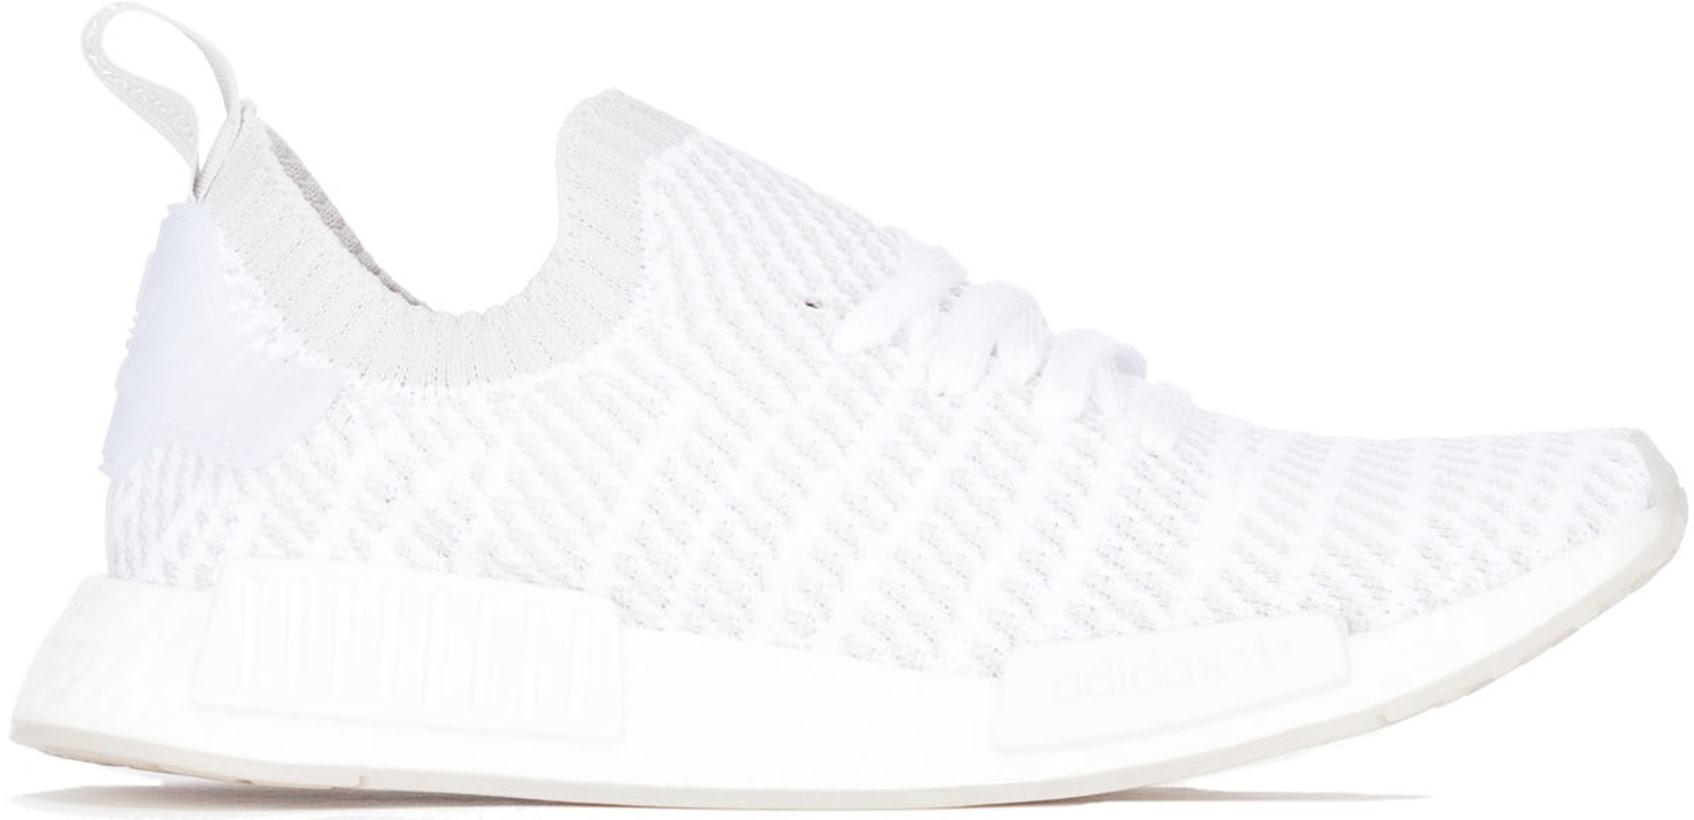 Adidas Nmd R1 Cloud White Core Black - Ajak Ngiklan